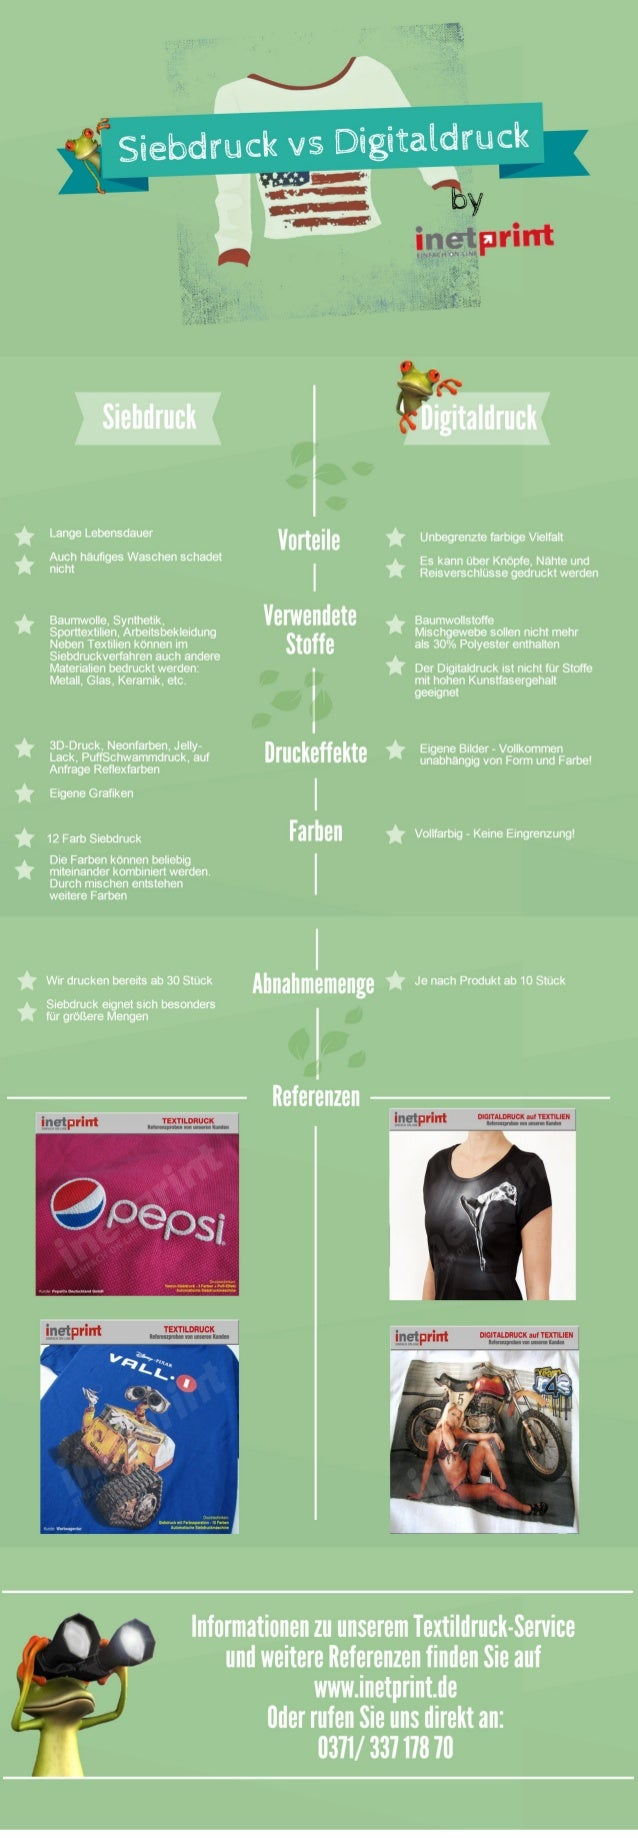 iNETPrint_siebdruck vs. digitaldruck